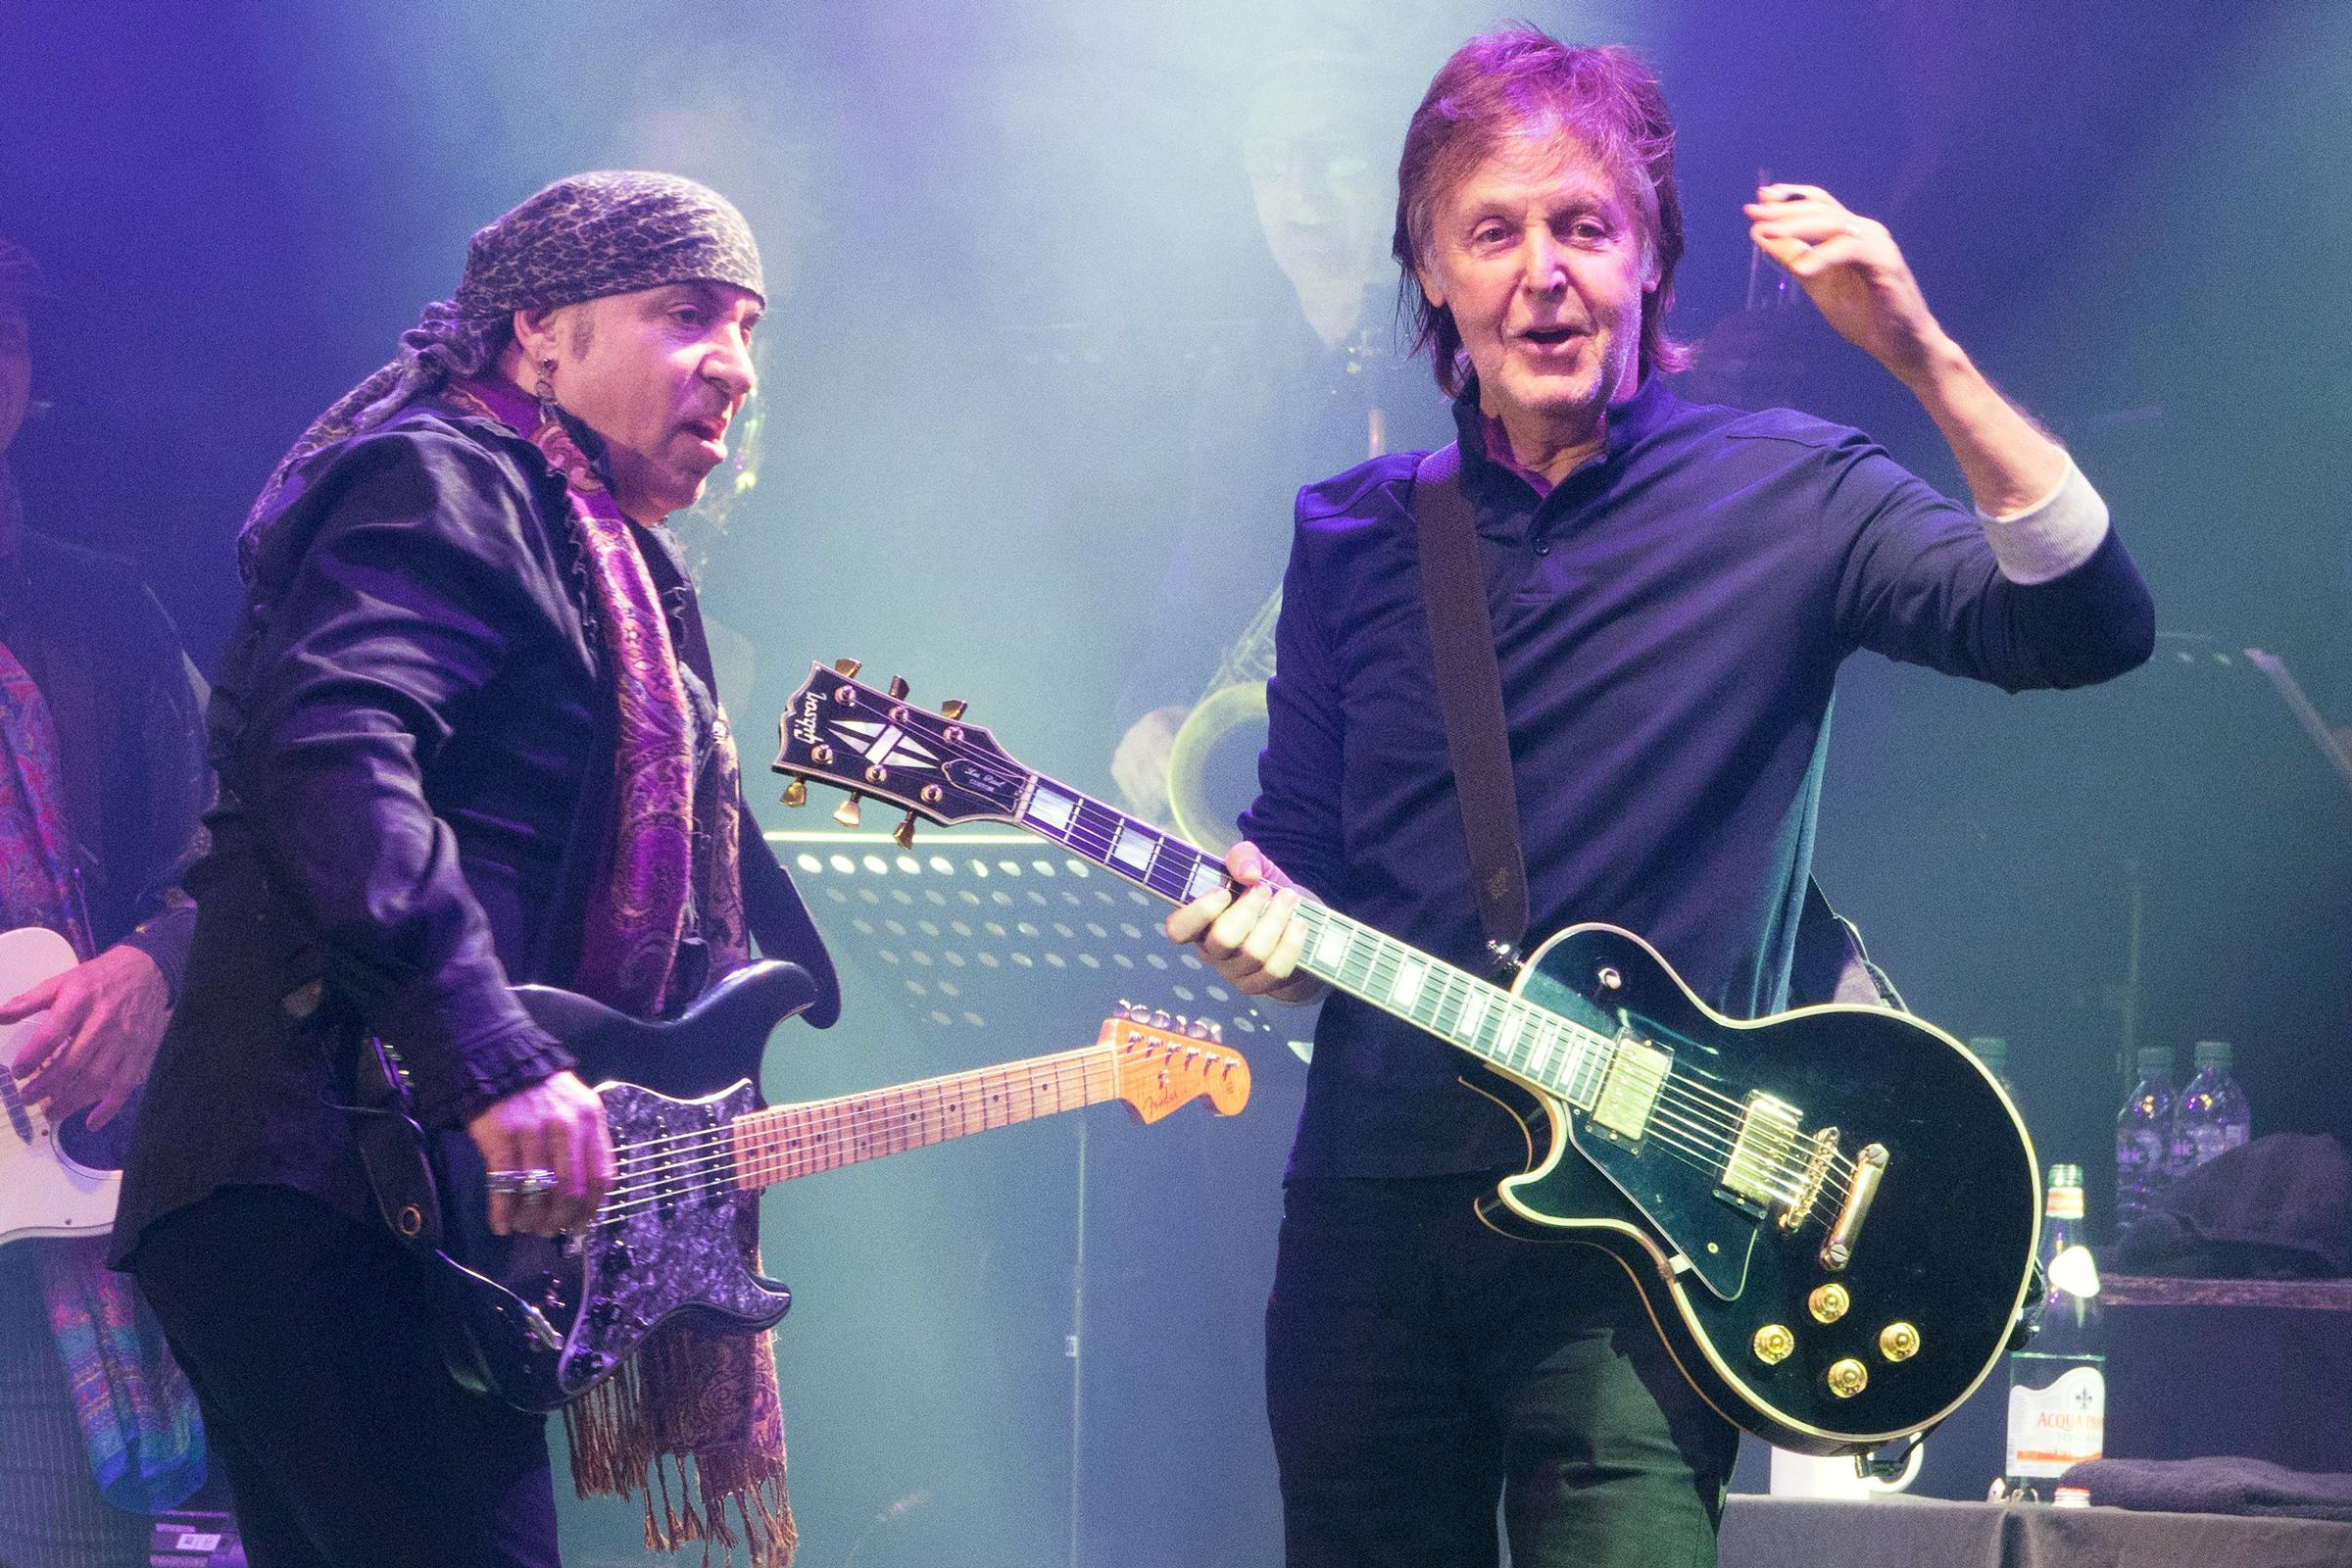 Little Steven Tour 2020 Watch Paul McCartney, Little Steven Cover Beatles – Rolling Stone